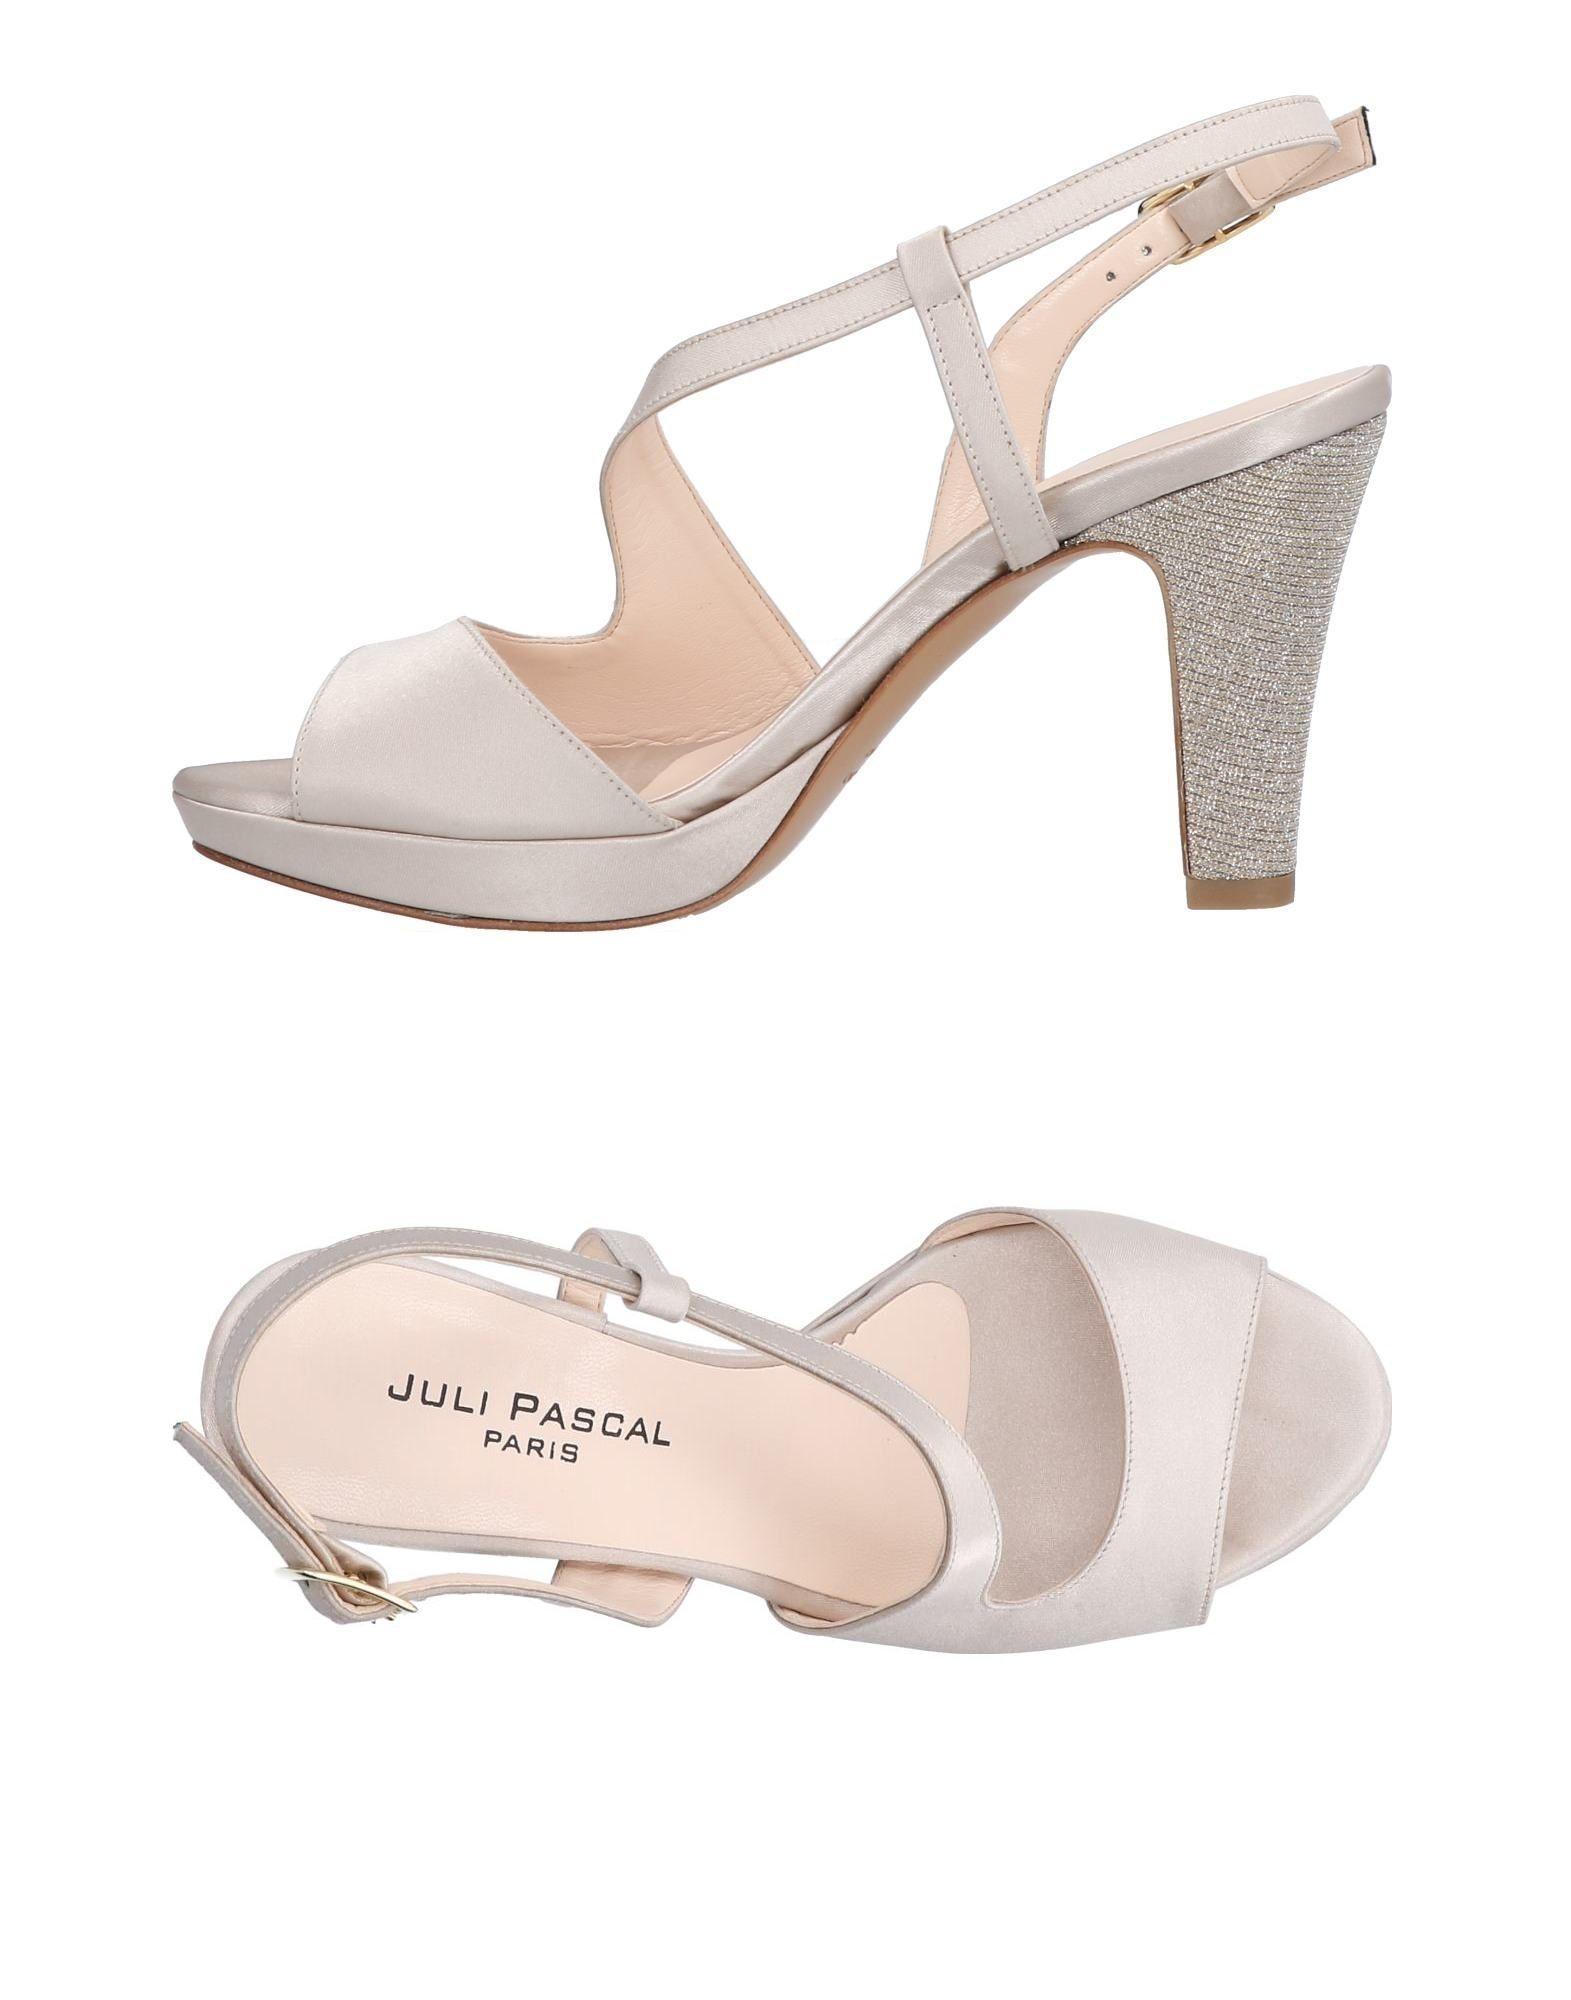 Juli Pascal Paris Neue Sandalen Damen  11455219OI Neue Paris Schuhe c88e5b